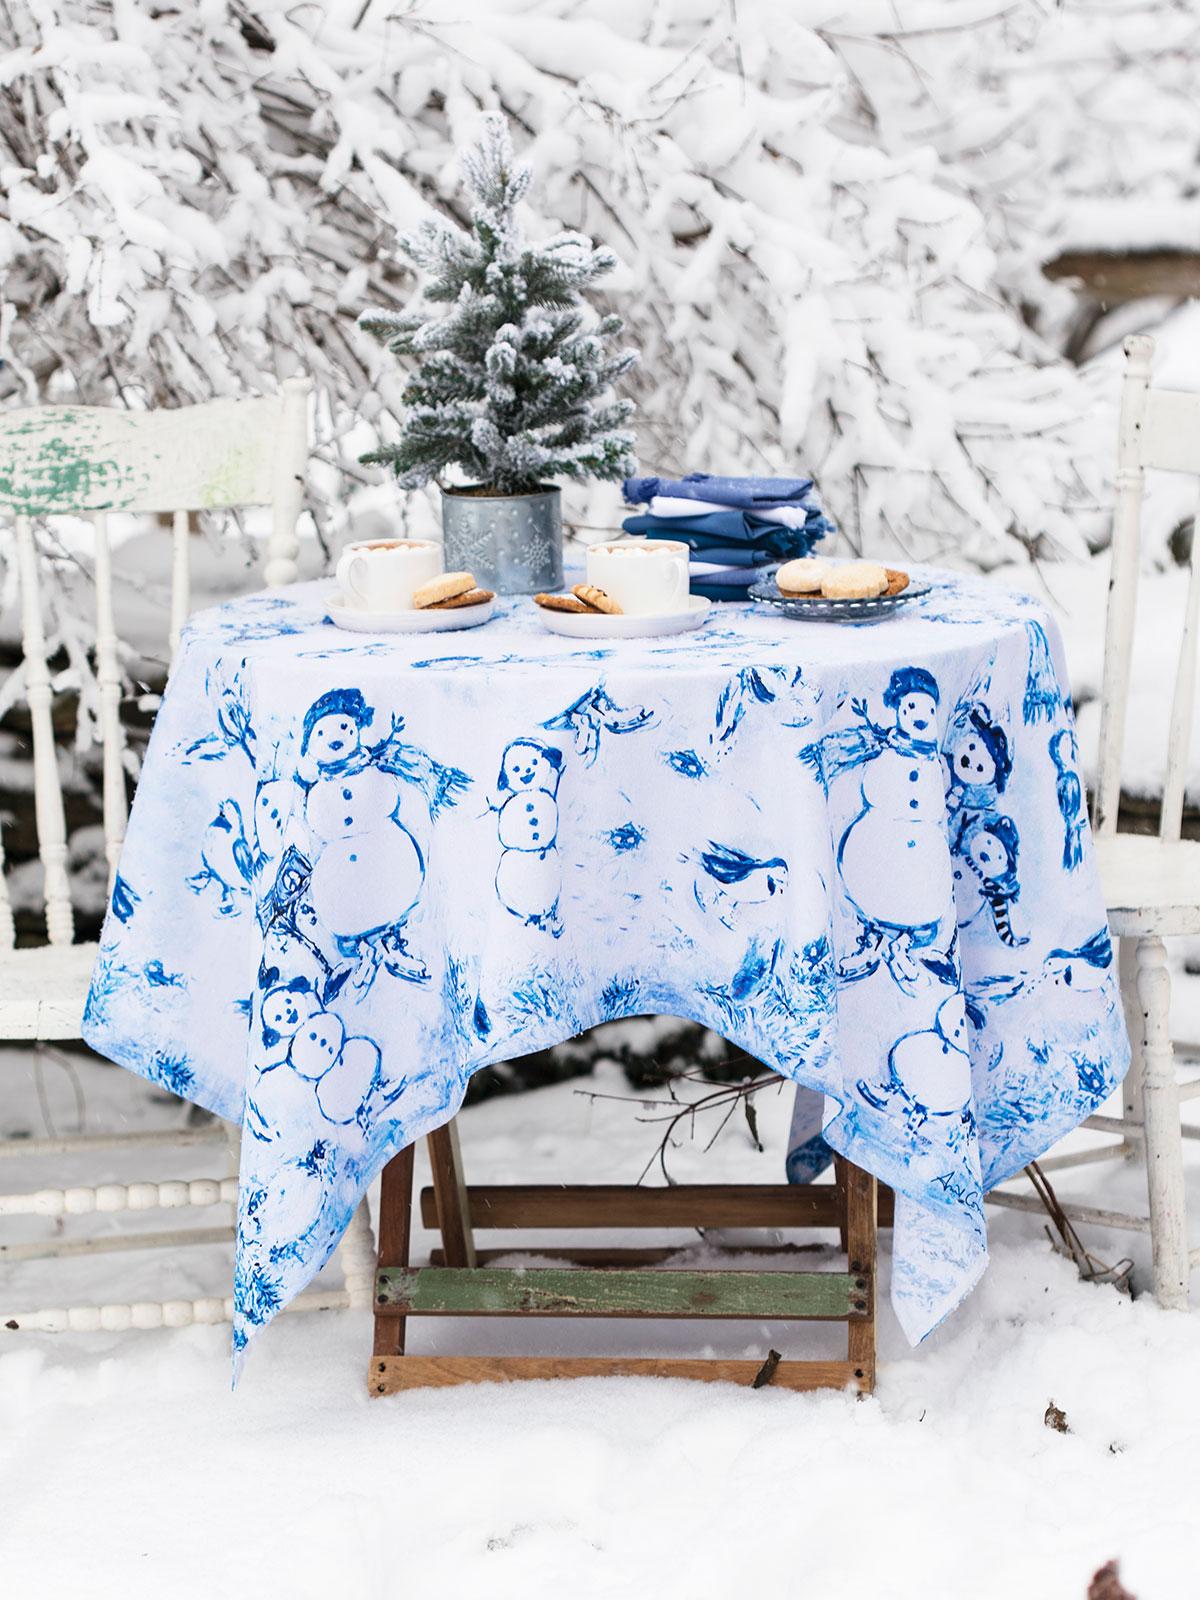 Snowman Tablecloth